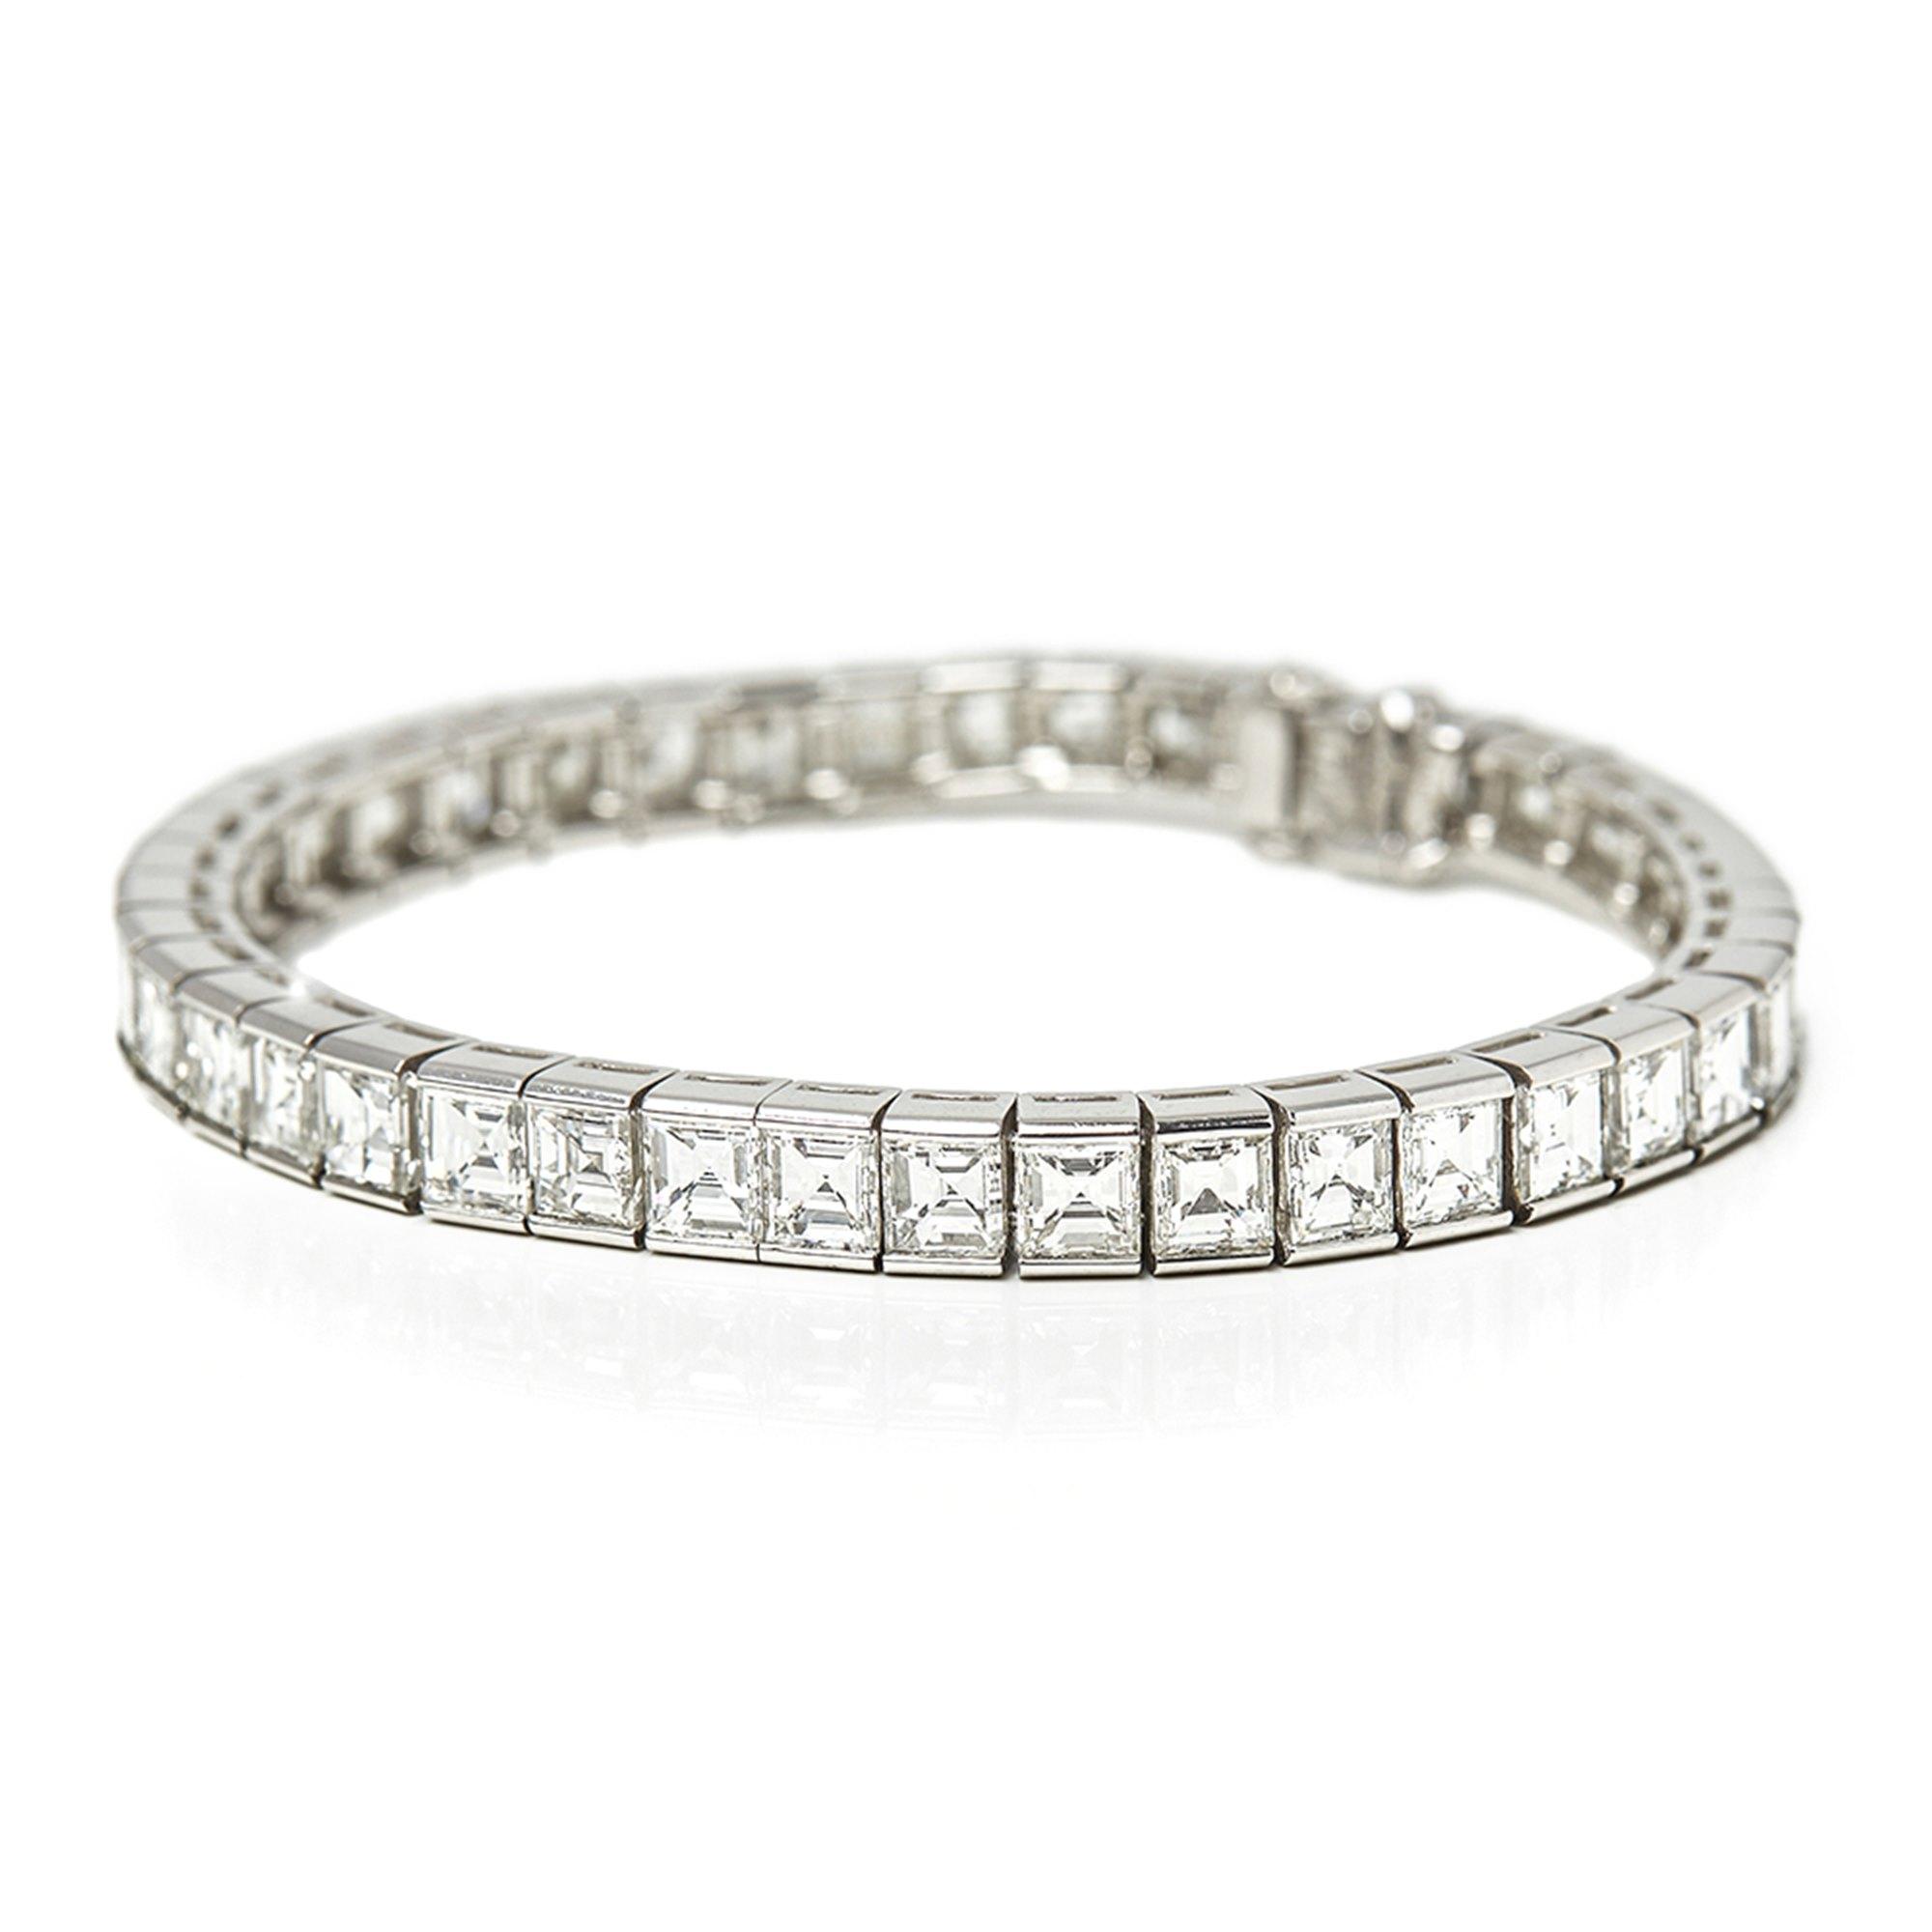 Cartier Platinum Emerald Cut Diamond Riviere Tennis Bracelet